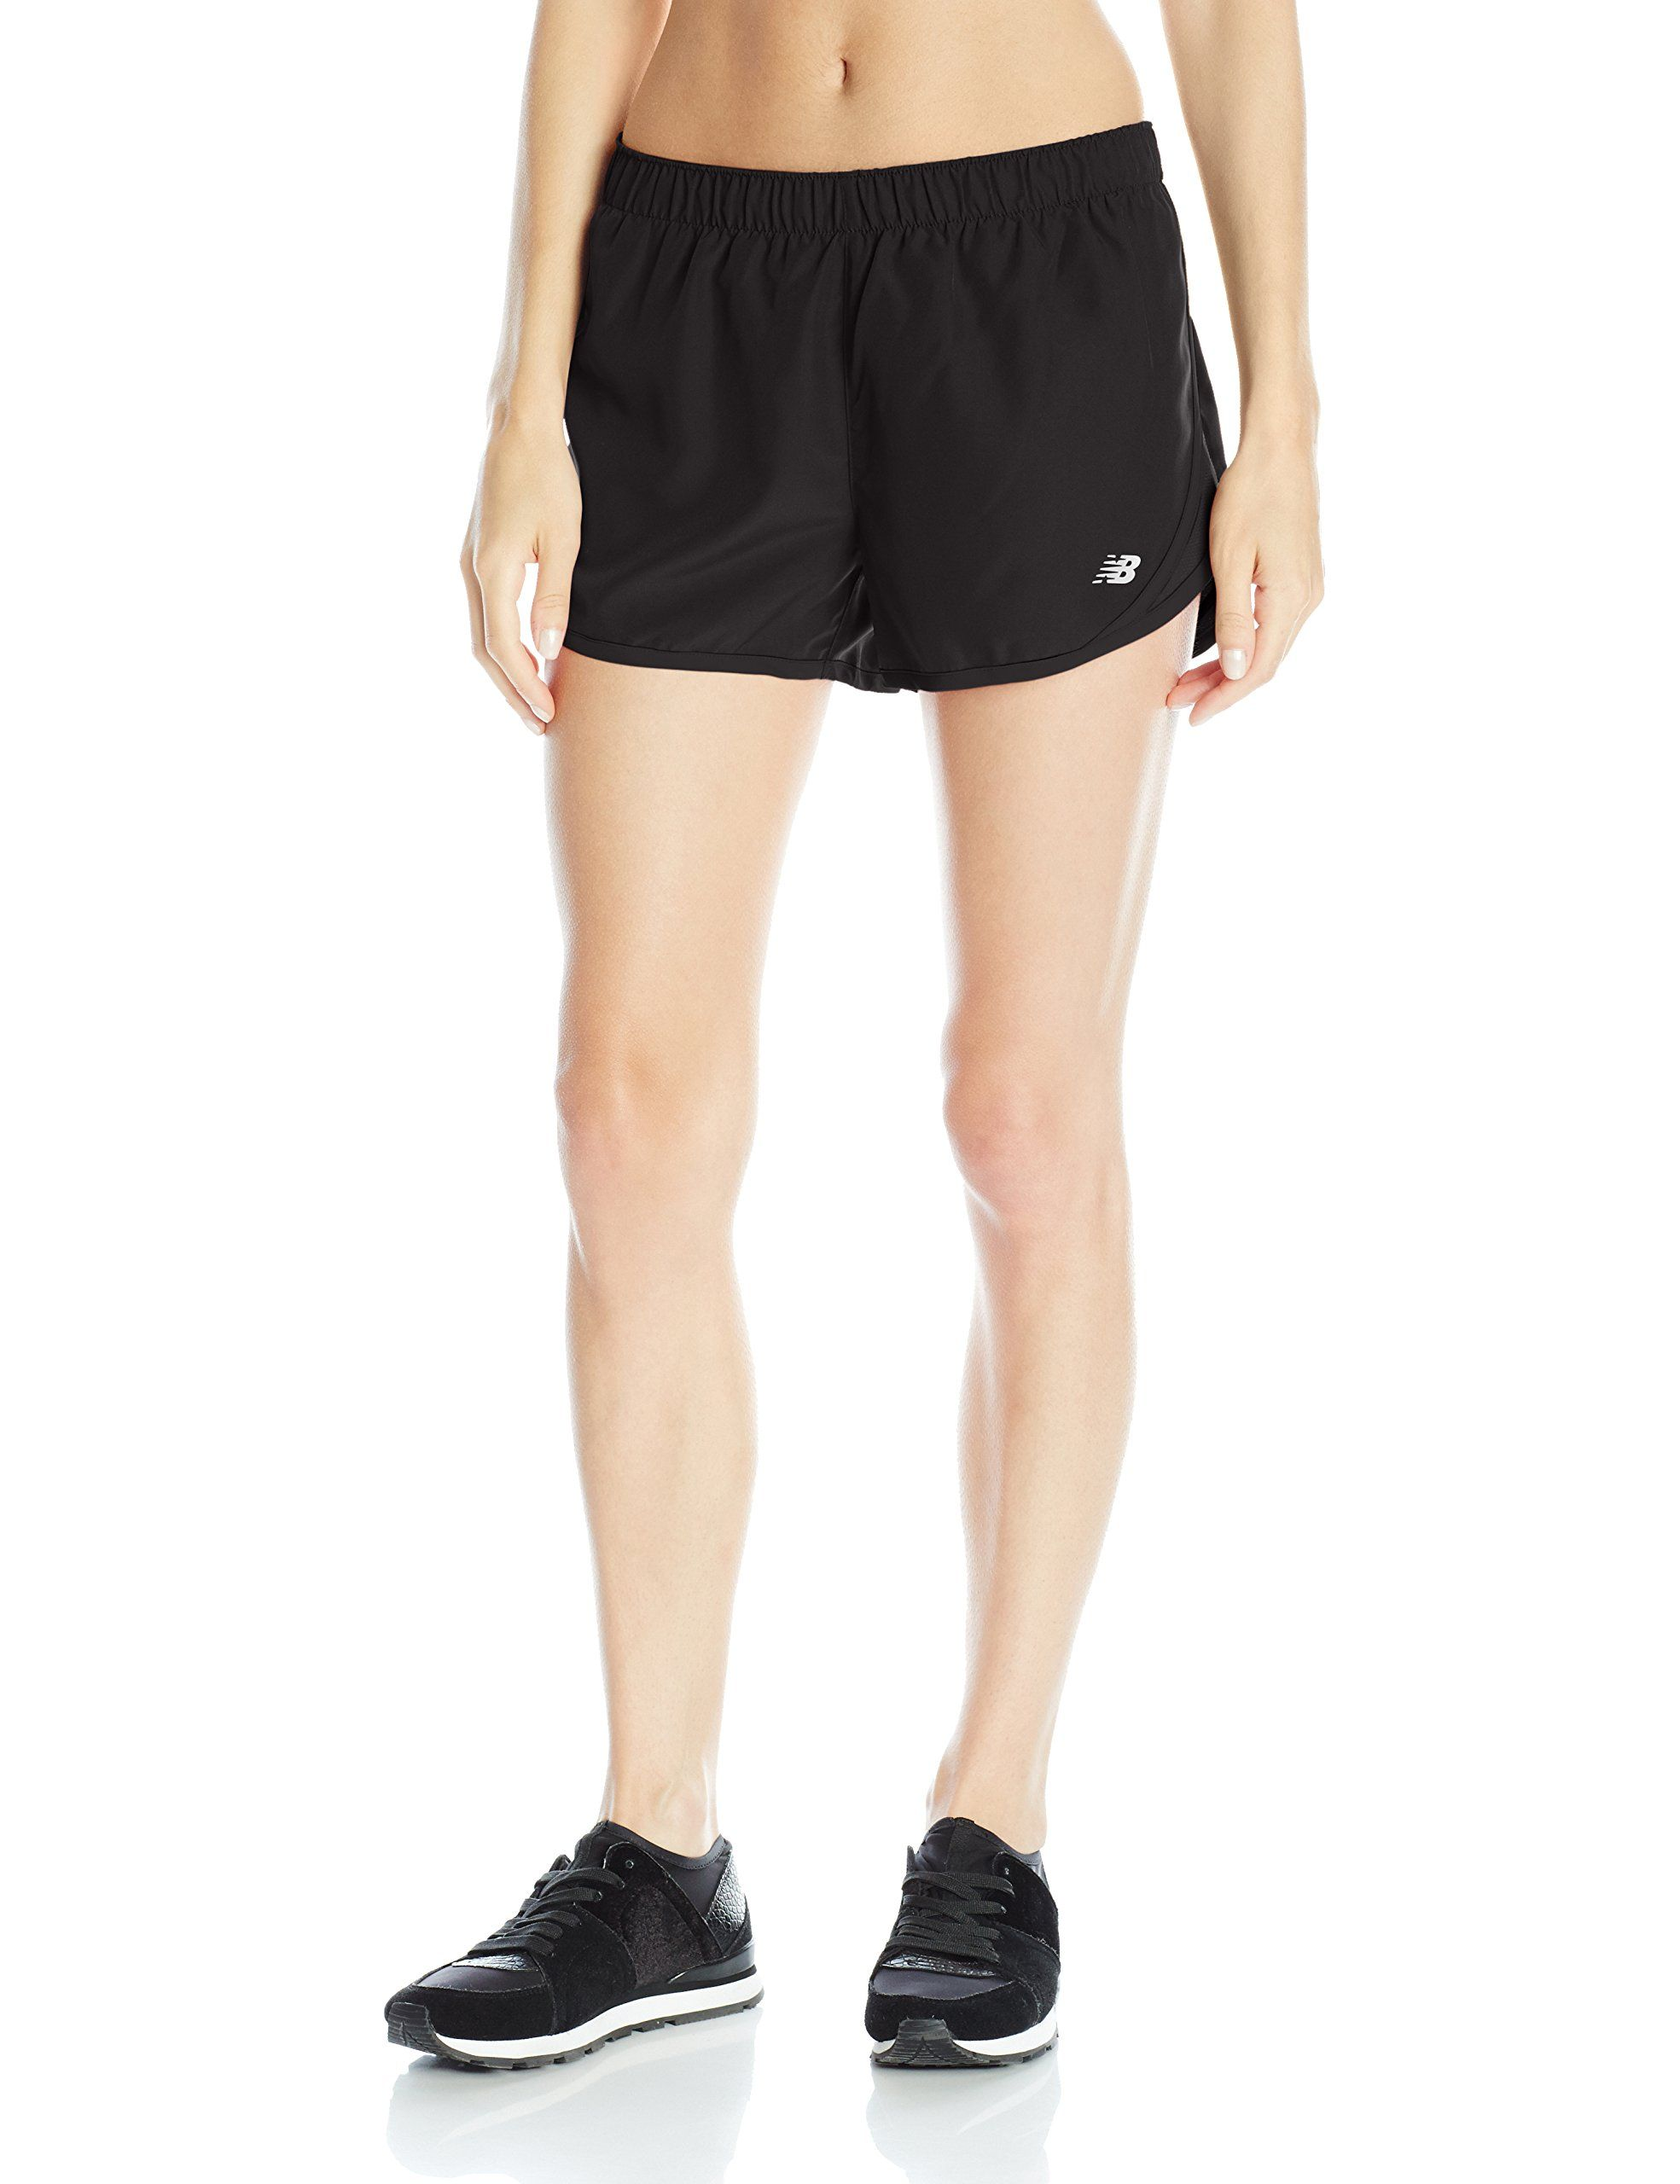 New Balance Women's Accelerate 2.5-Inch Shorts, Black, X-Large